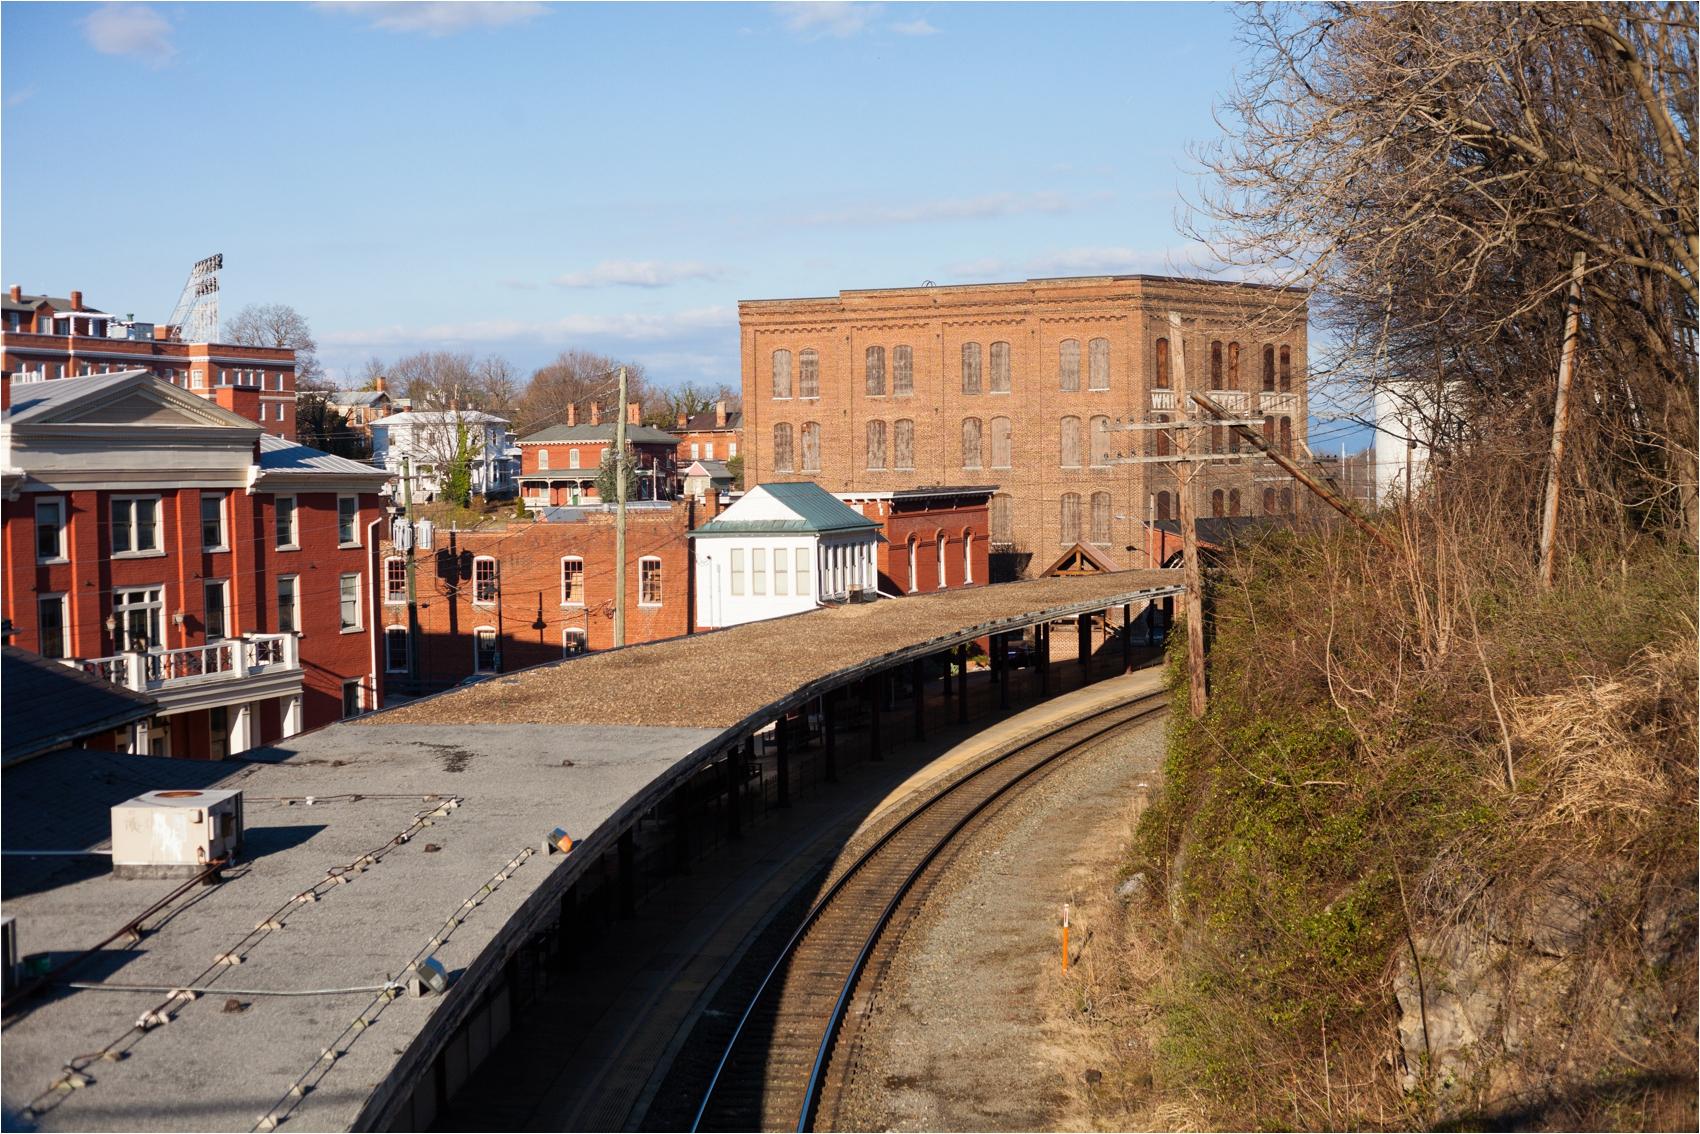 Downtown-Staunton-VA-Spring-Engagement-Session-2931.jpg